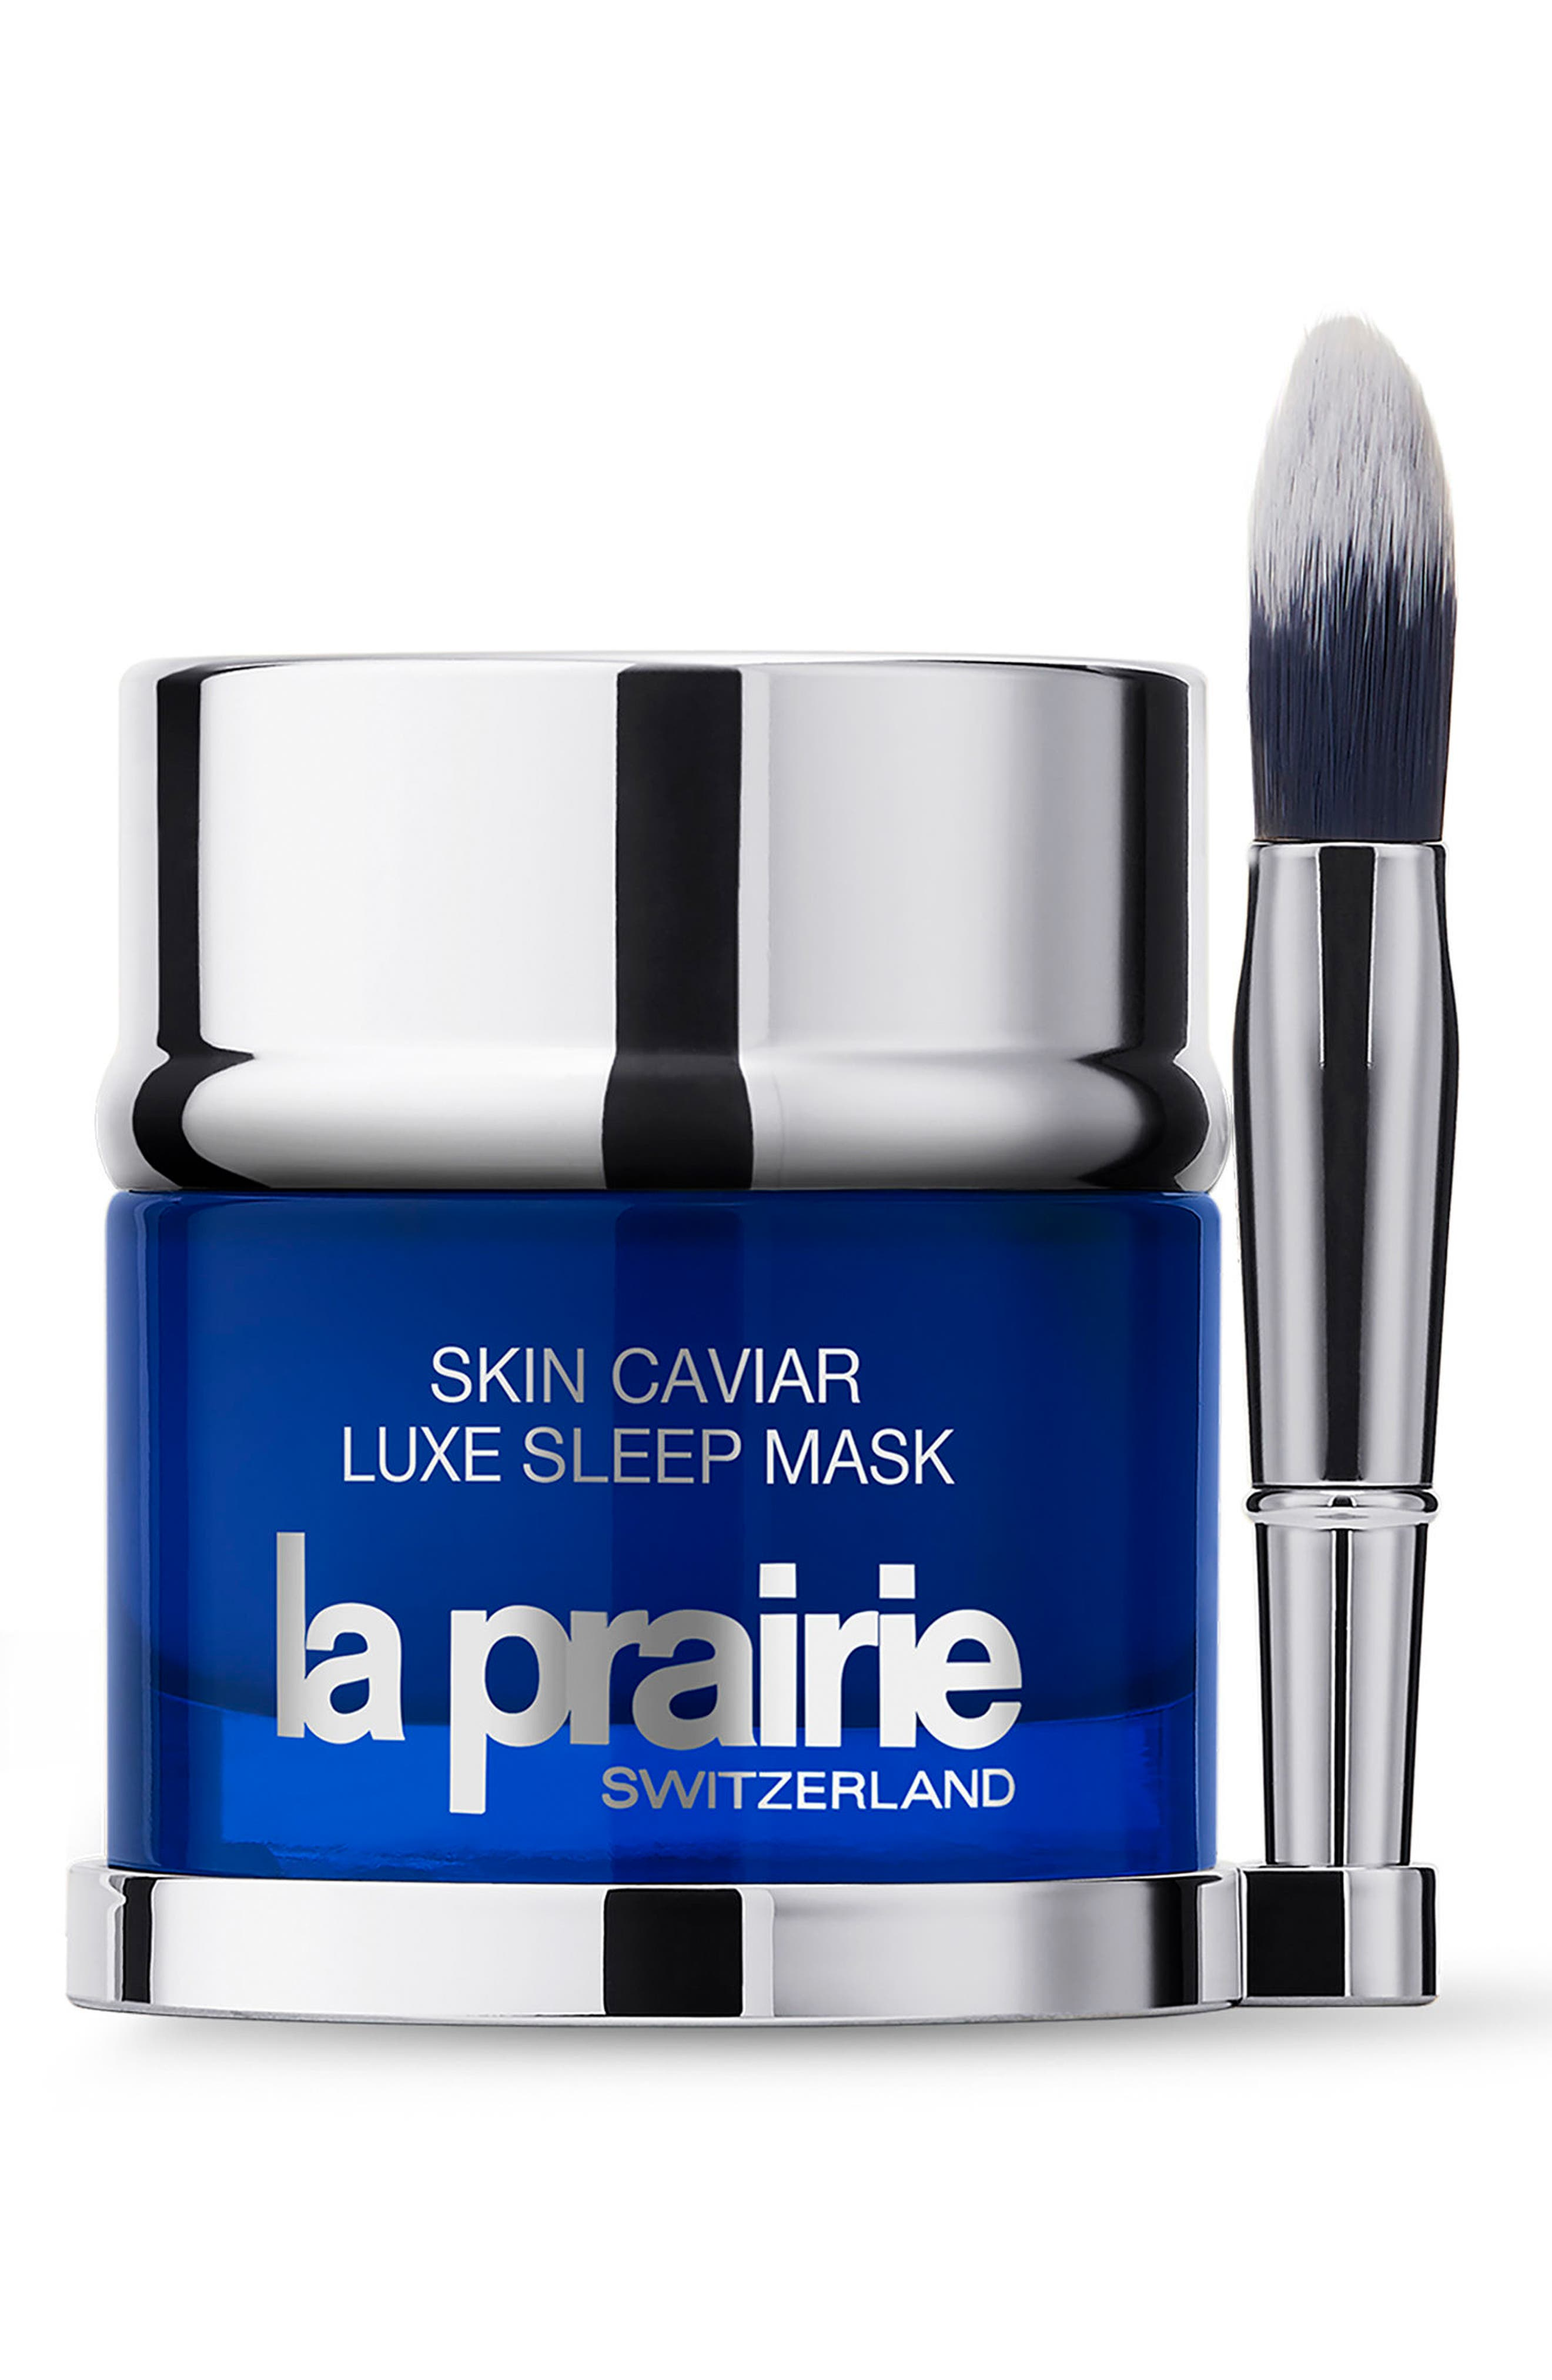 Alternate Image 1 Selected - La Prairie 'Skin Caviar' Luxe Sleep Mask